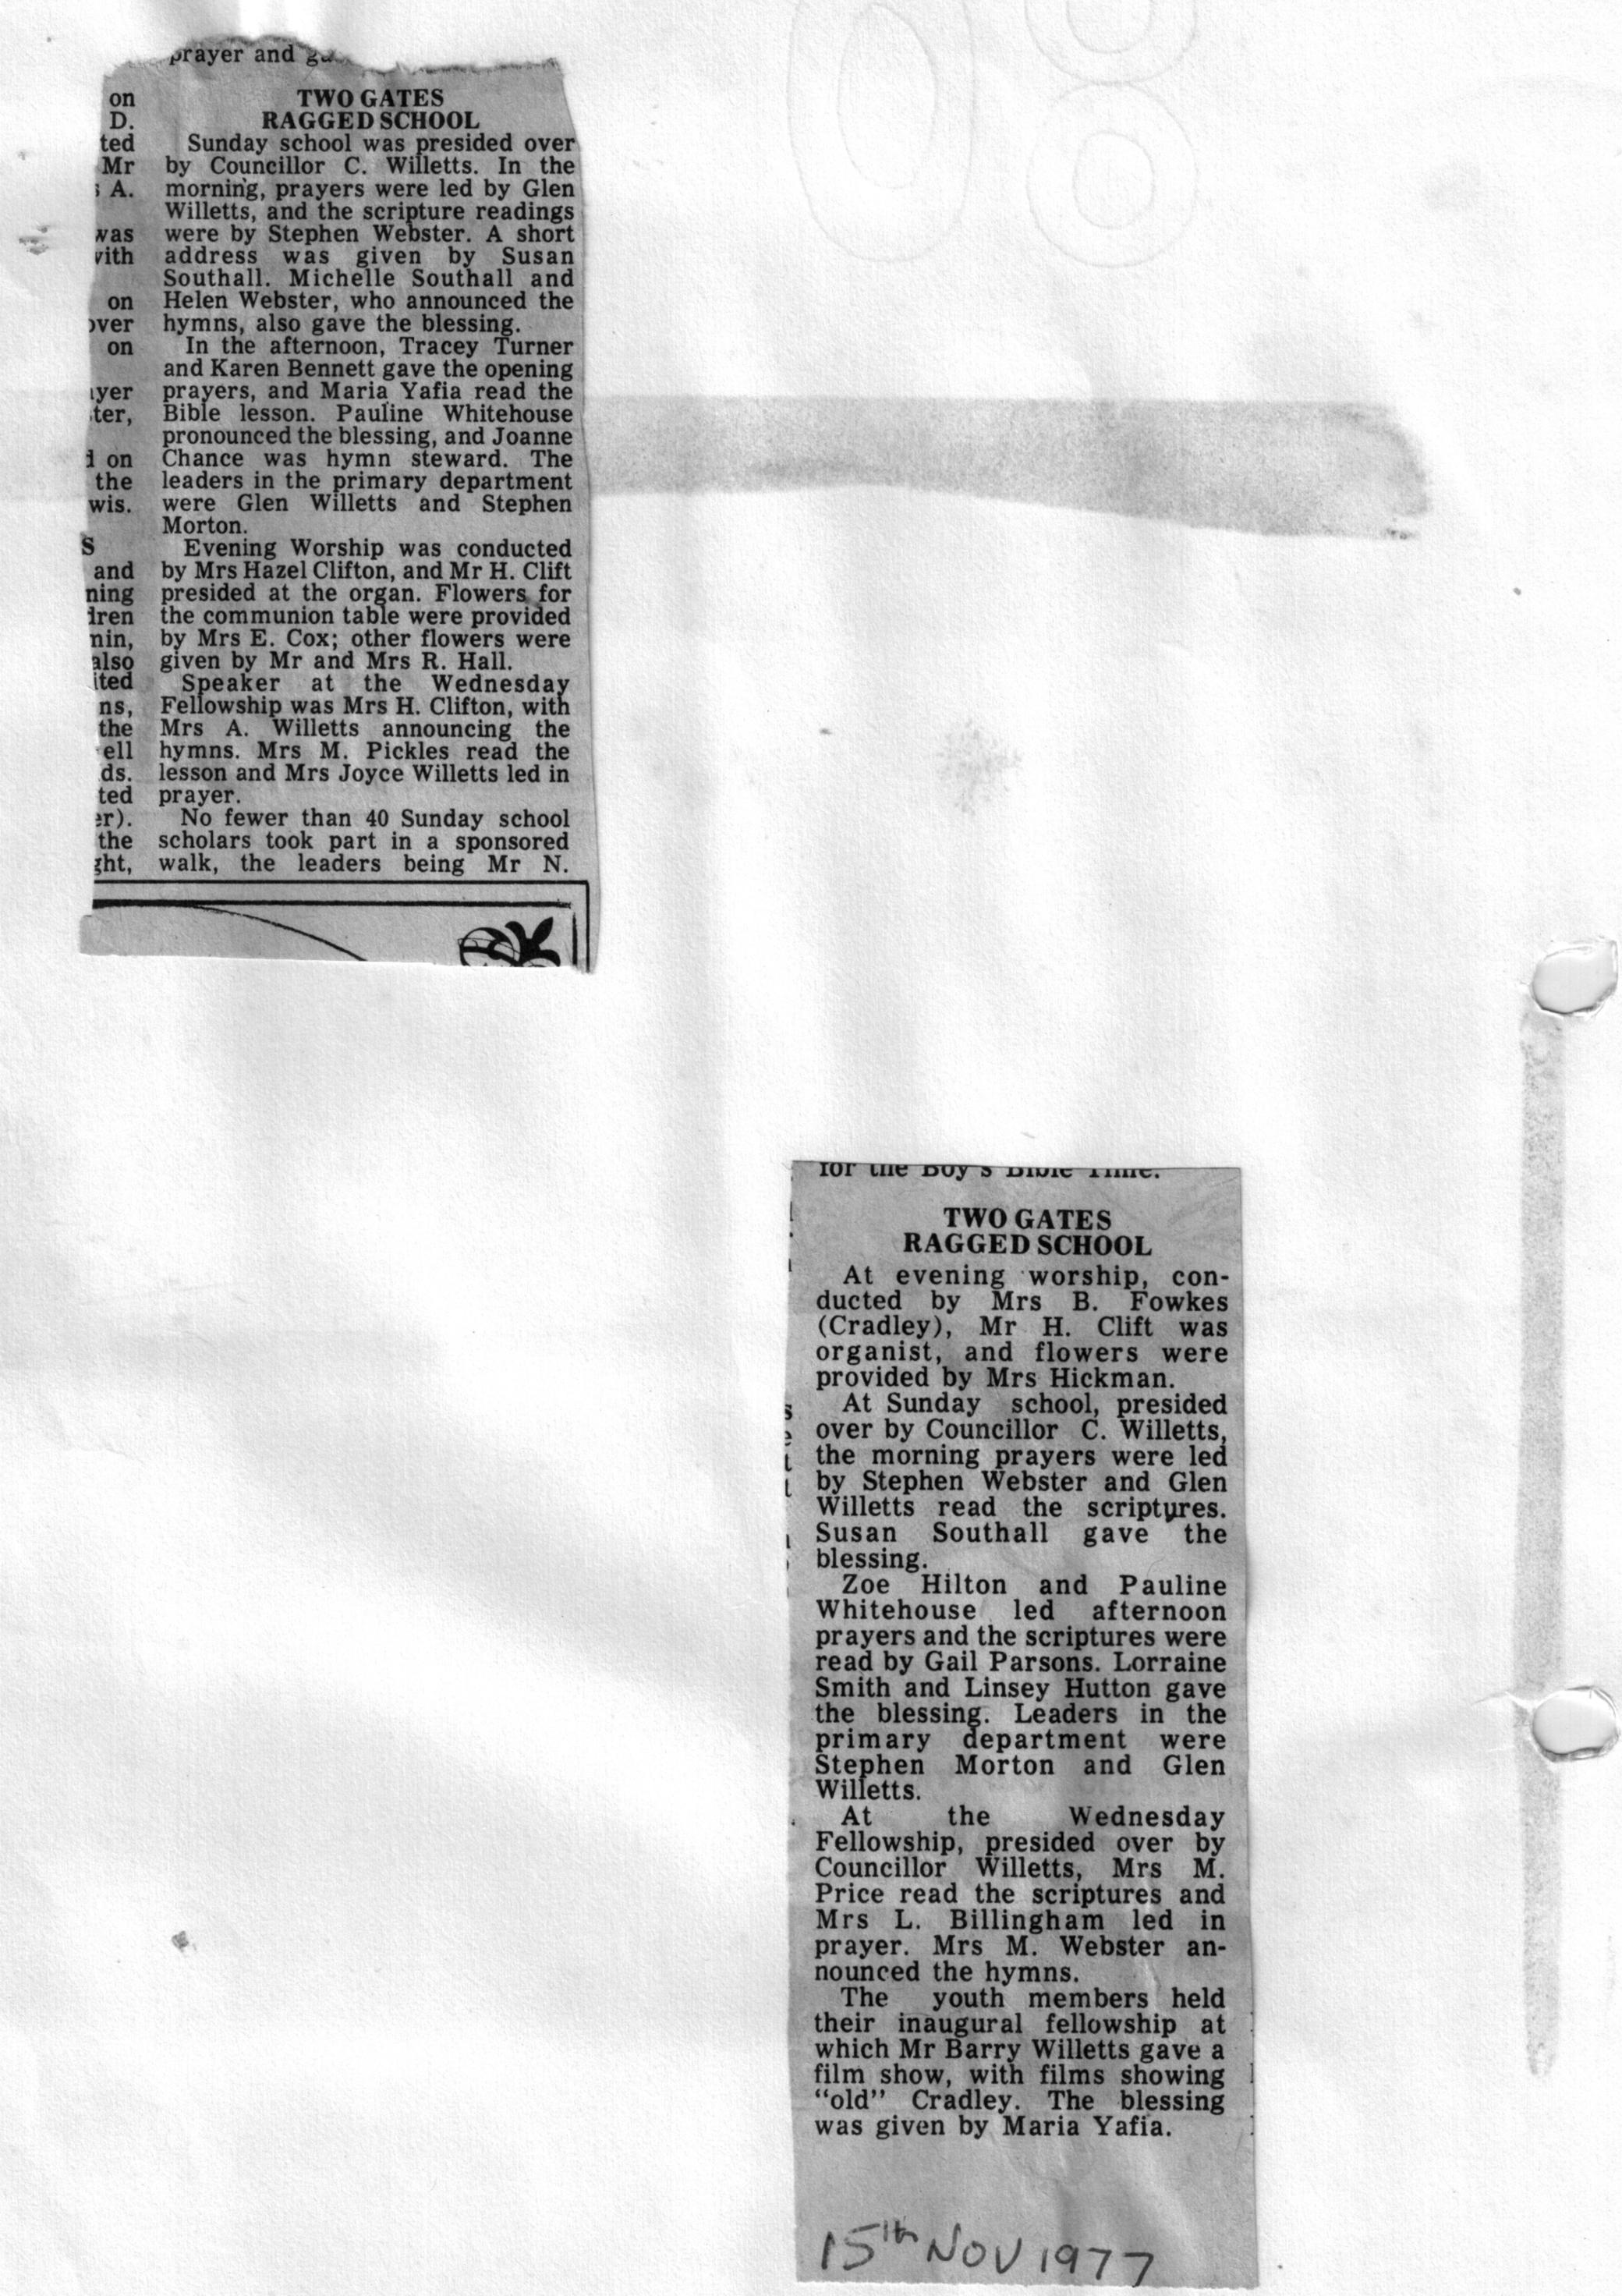 P043_PRESS_Nov-1977